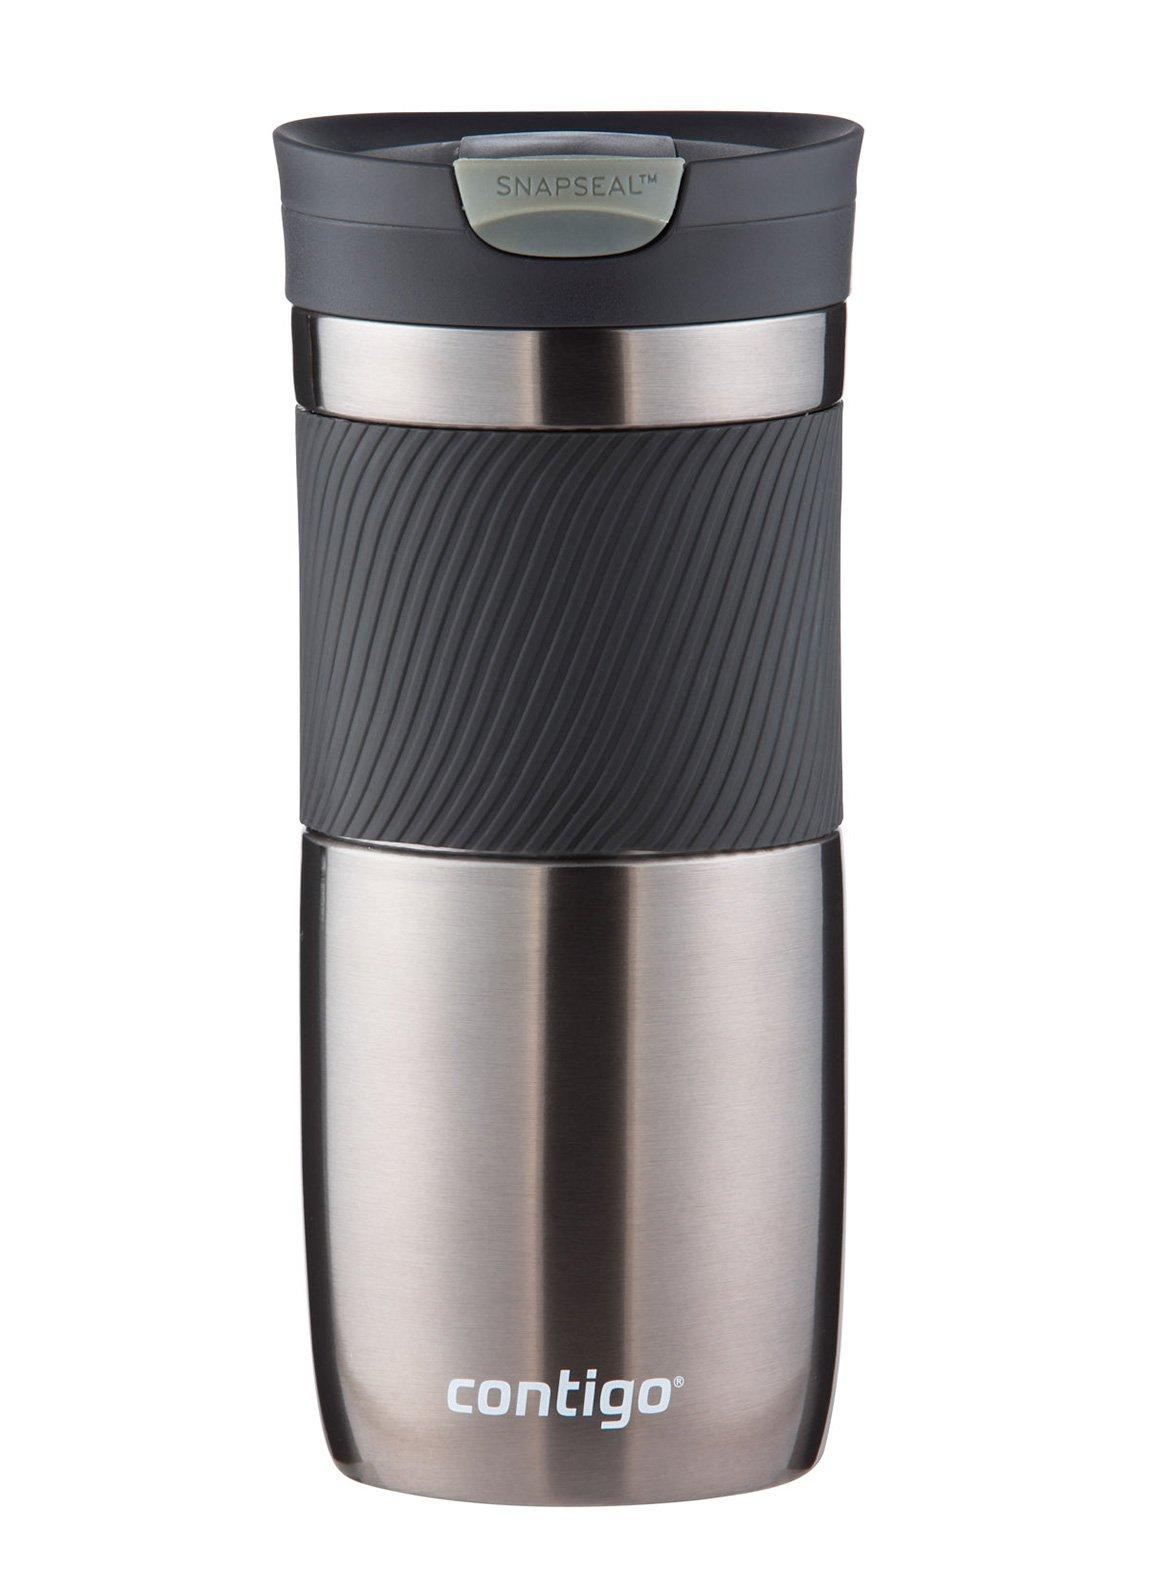 Contigo SnapSeal Byron Vacuum-Insulated Stainless Steel Travel Mug, 16 oz., Gunmetal by Contigo